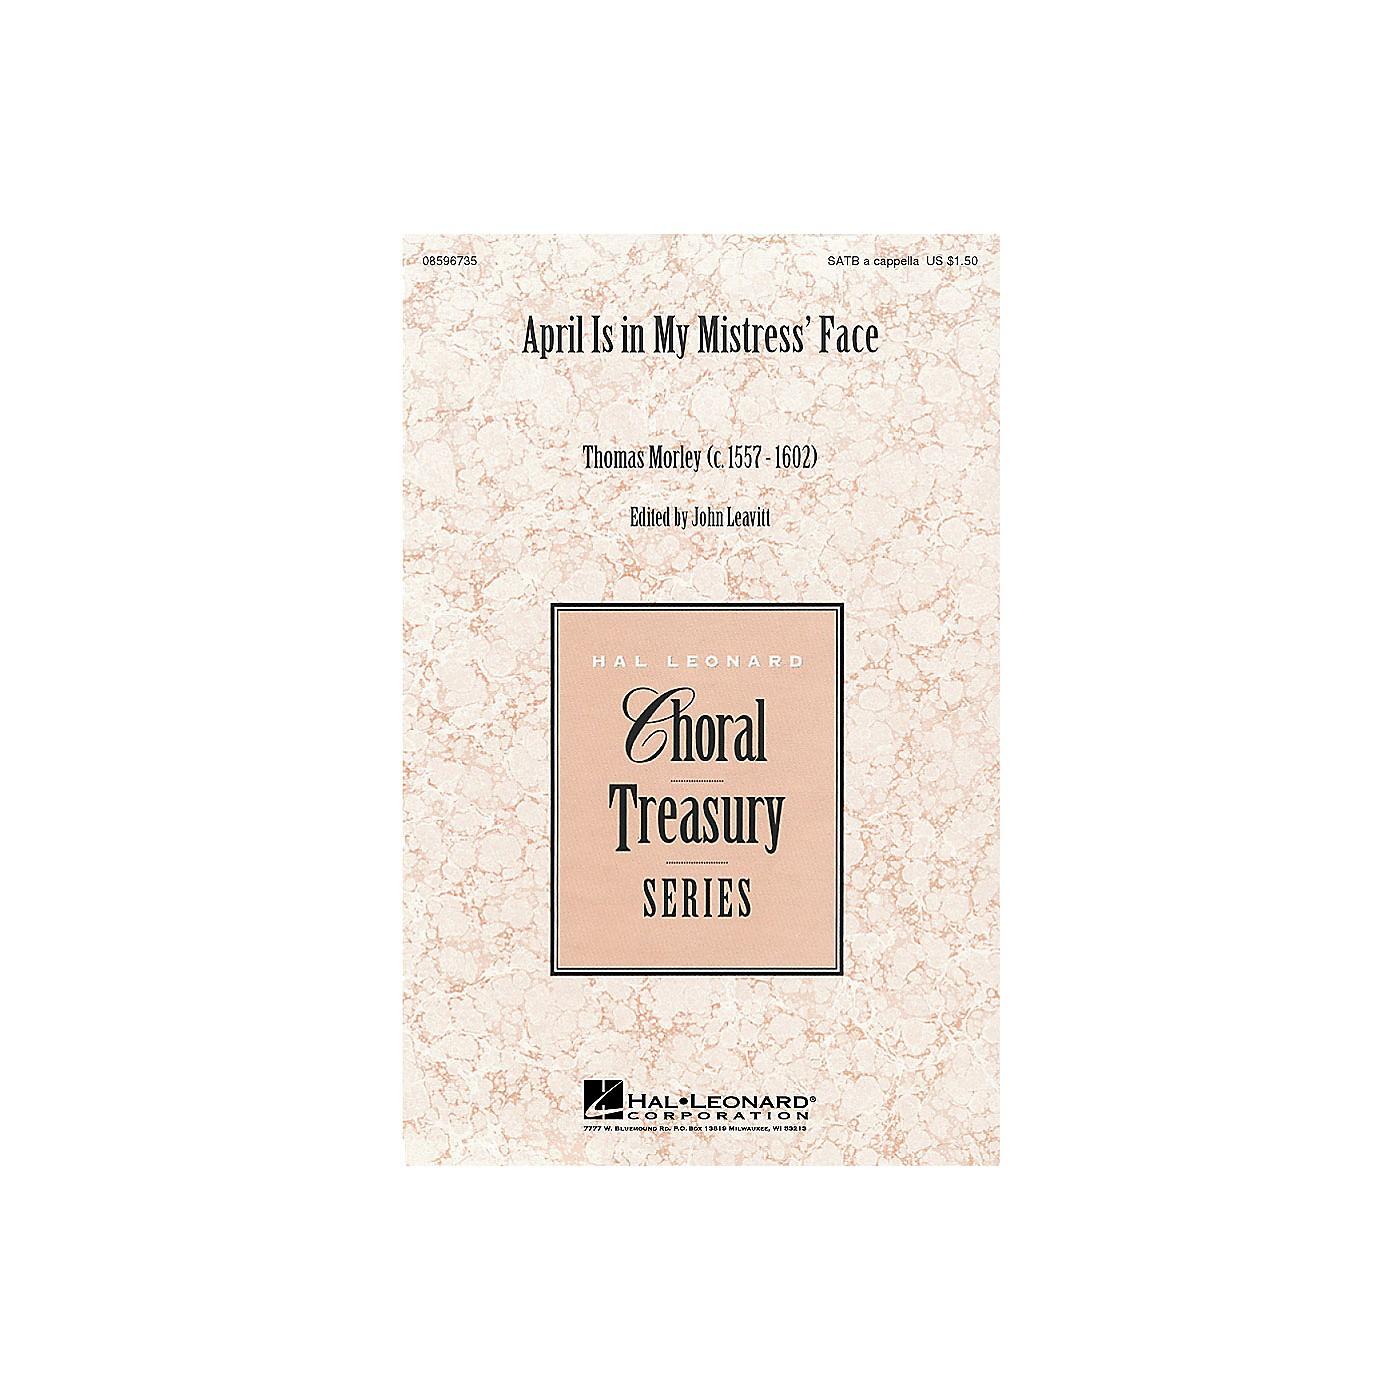 Hal Leonard April Is in My Mistress' Face (SATB) SATB a cappella arranged by John Leavitt thumbnail